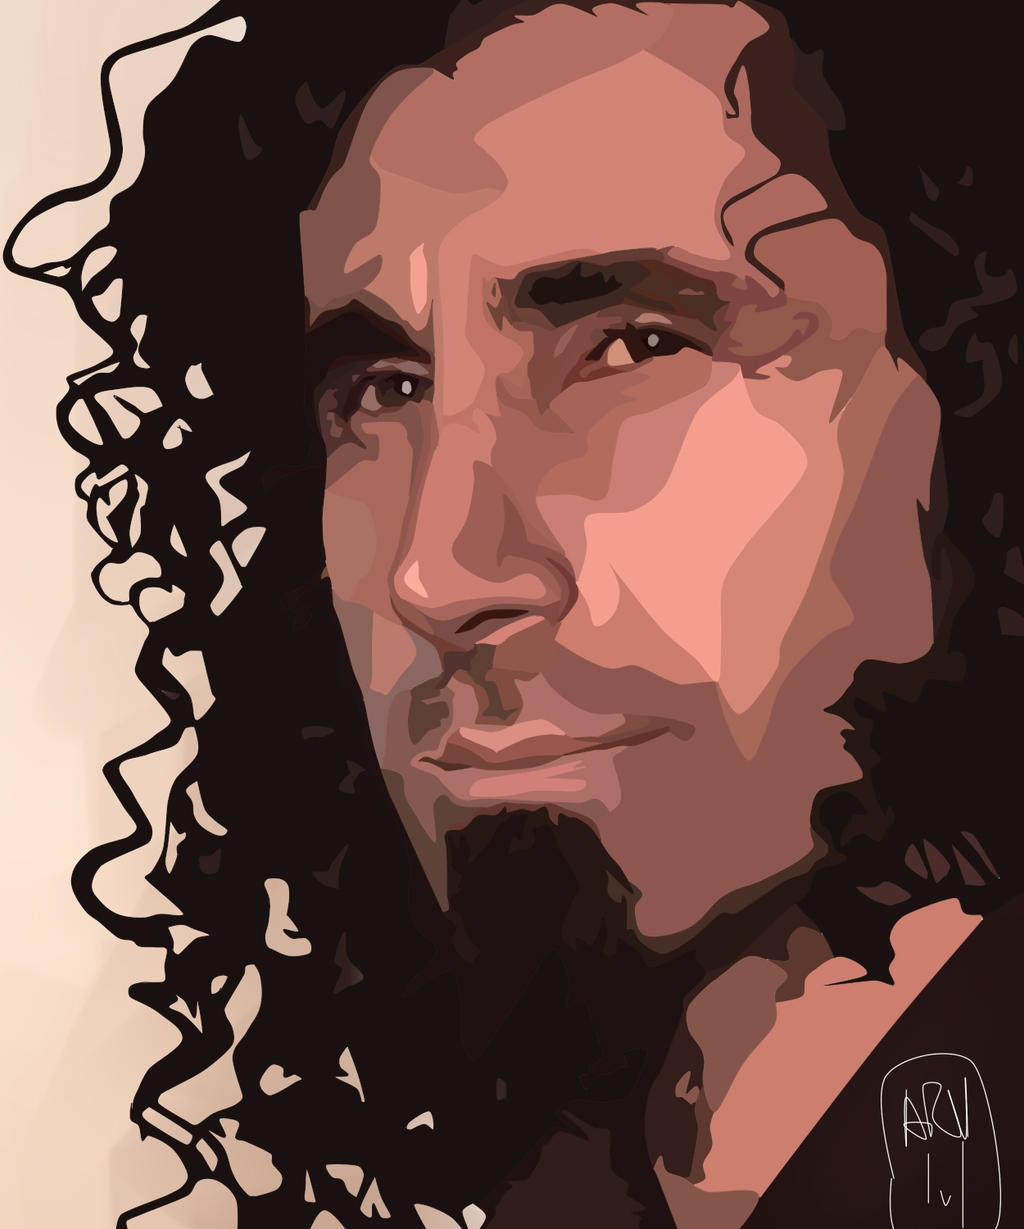 Serj Tankian by ARandomUserl-l